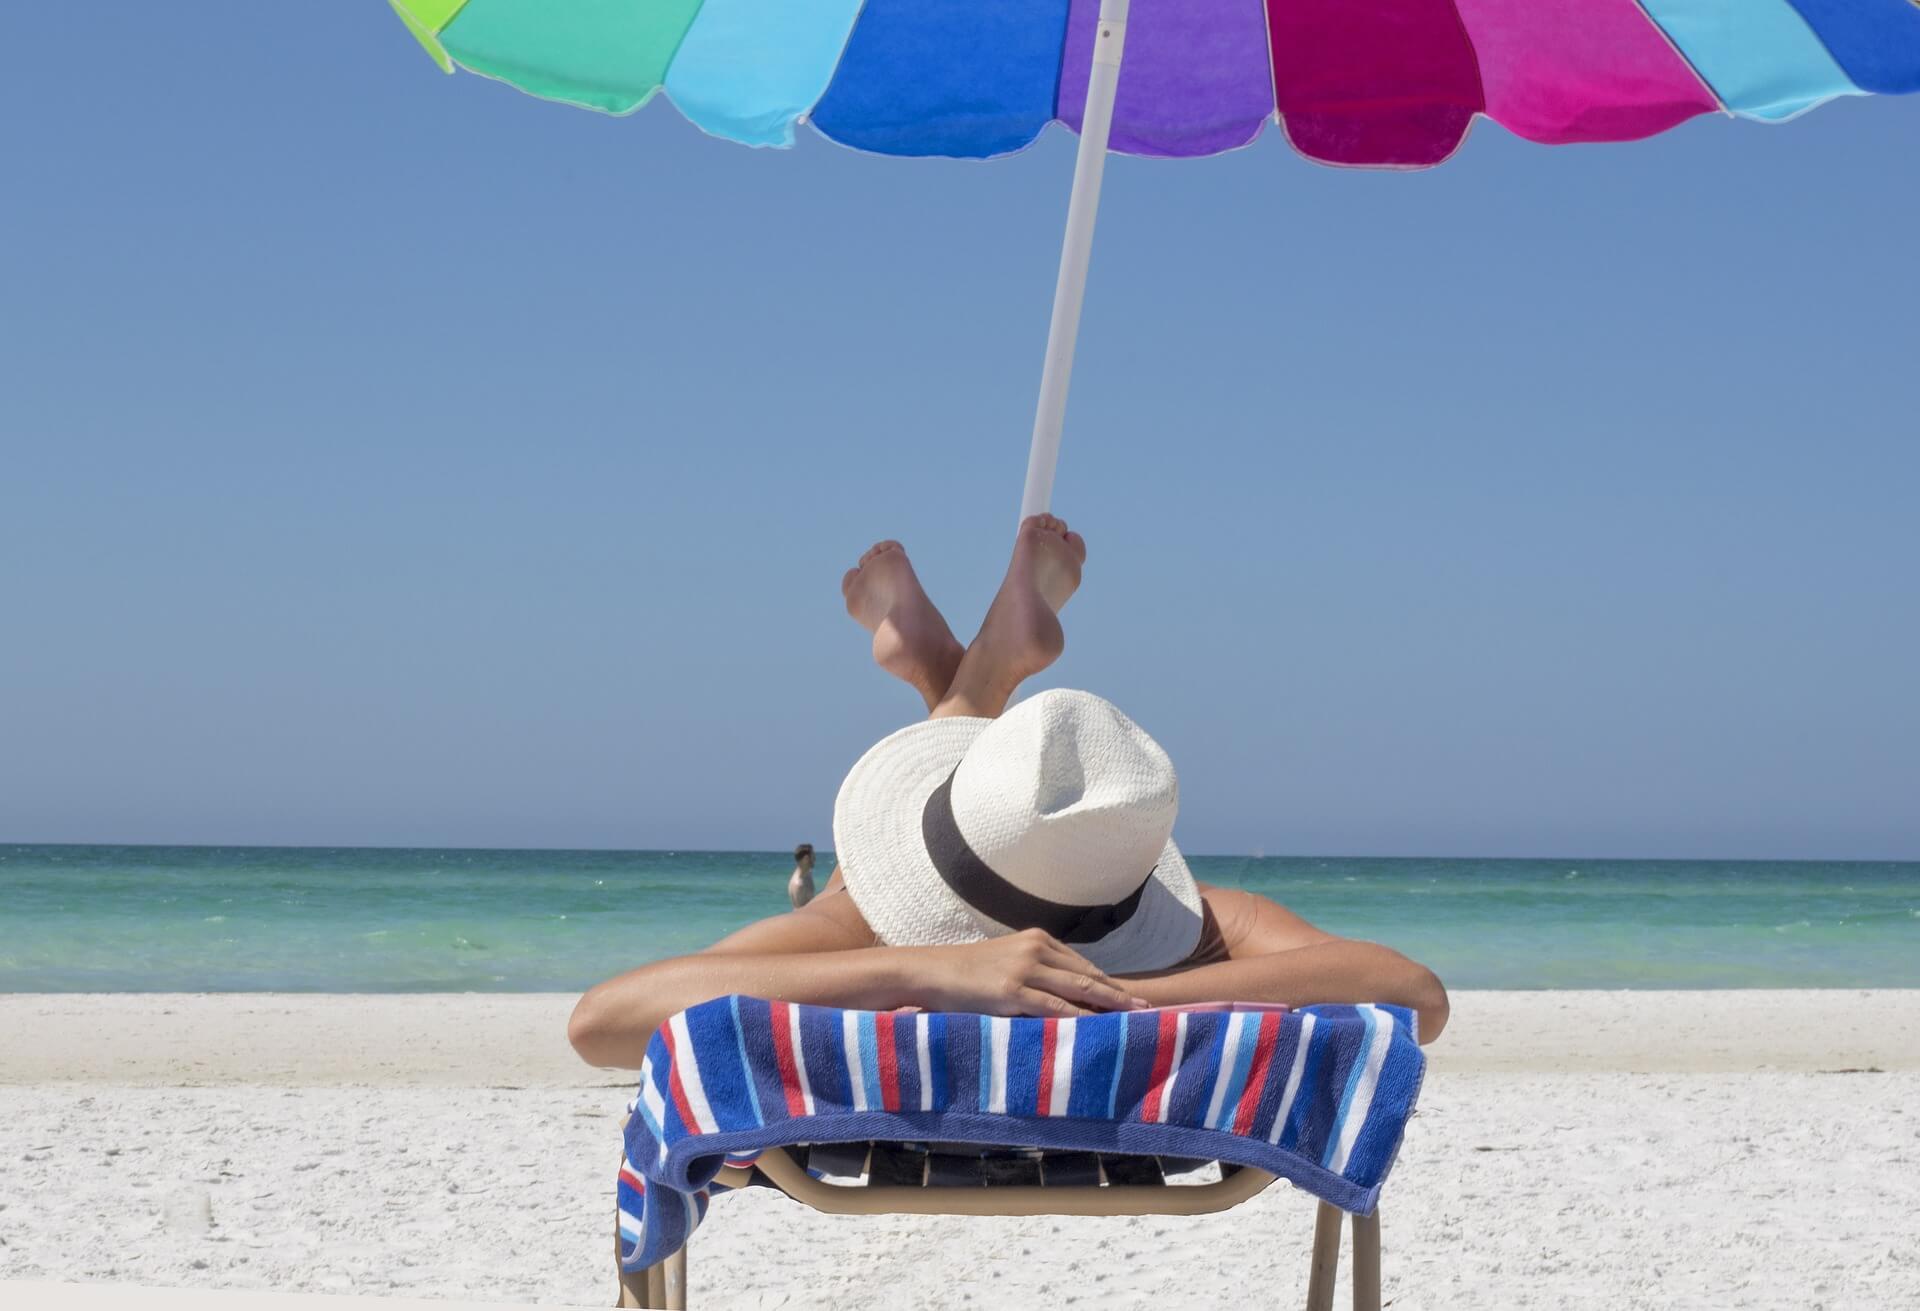 FUN-FILLED SUMMER BEACH DAY